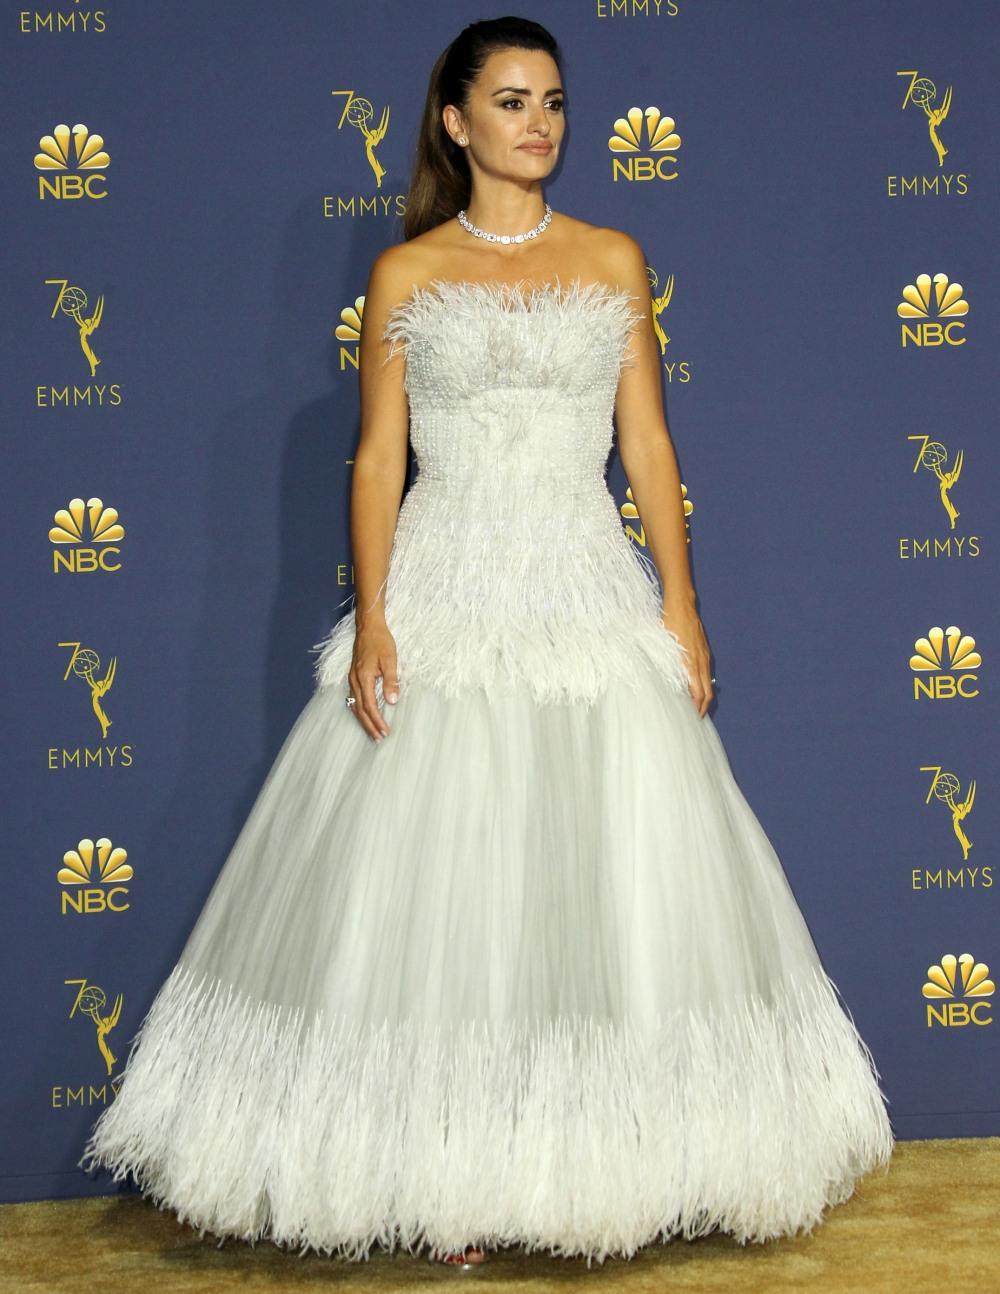 70th Emmy Awards (2018) Press Room